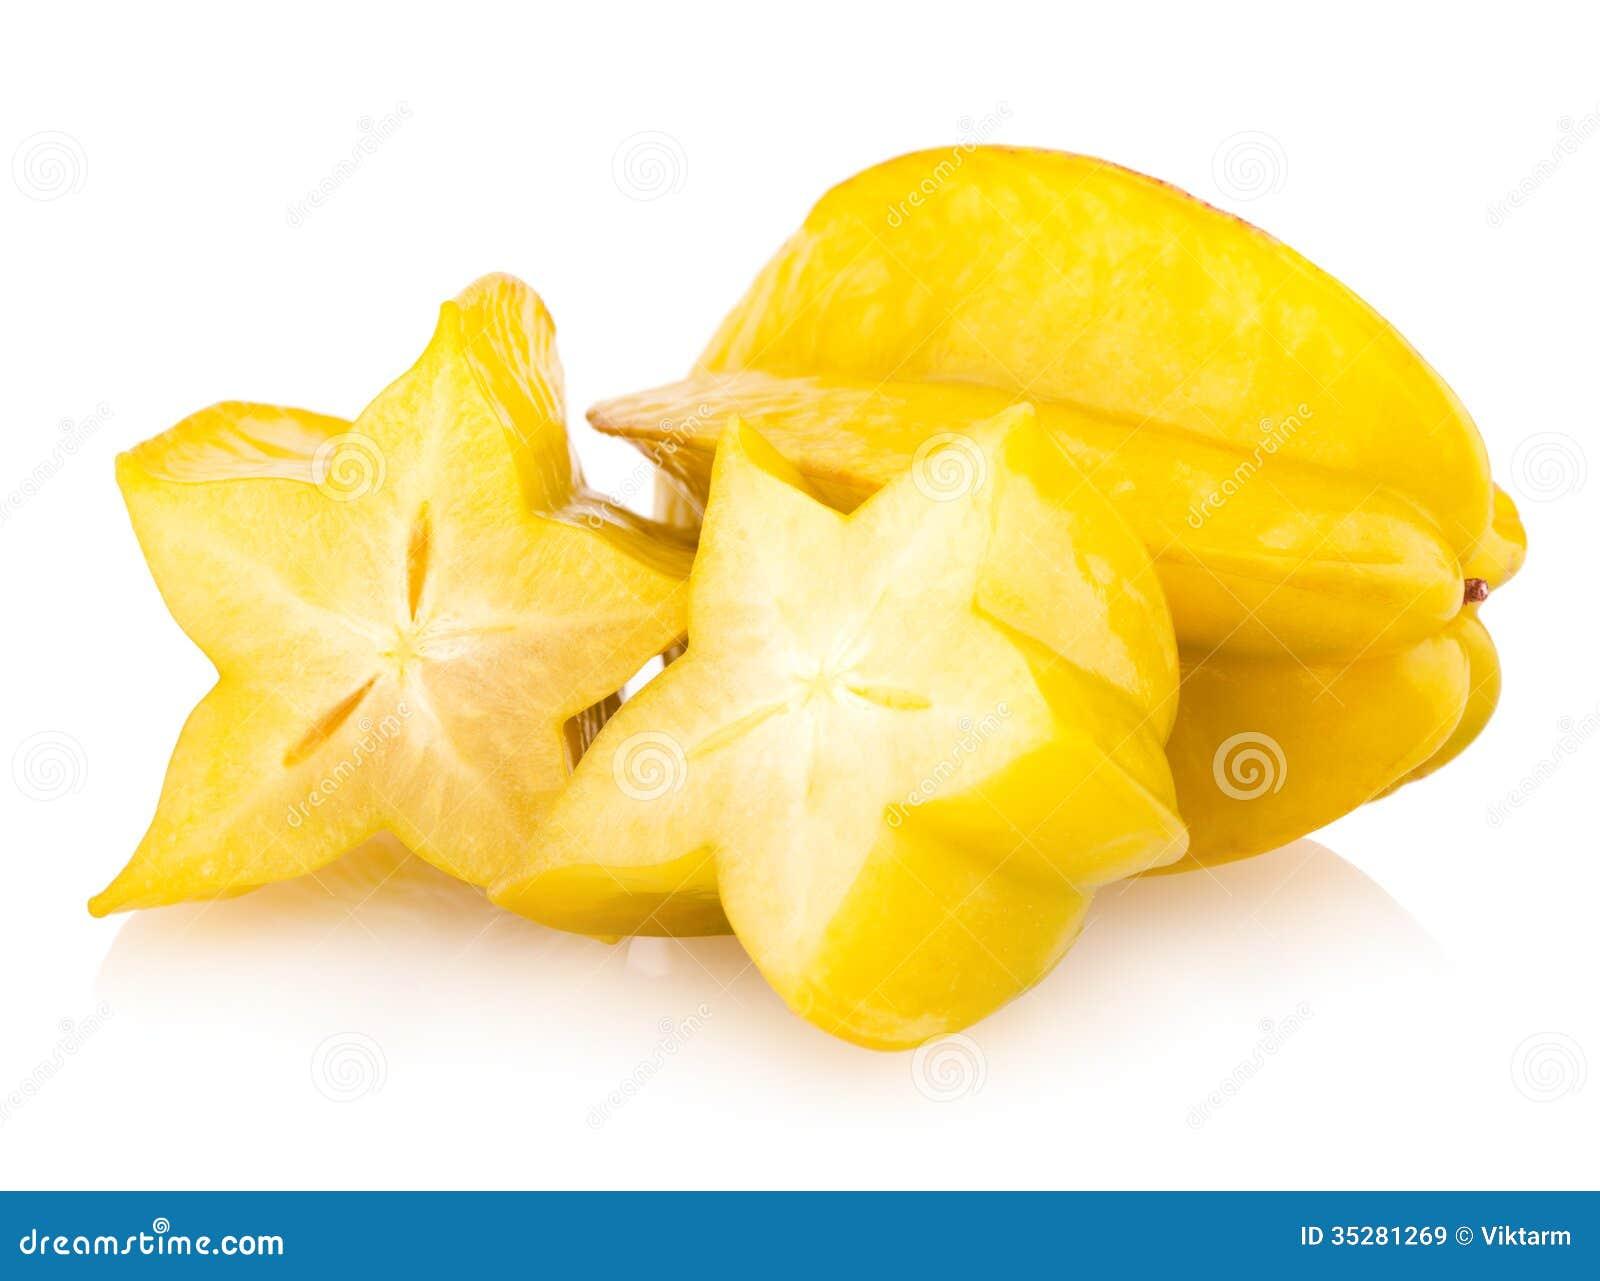 Carambola - Star Fruit Royalty Free Stock Images - Image: 35281269